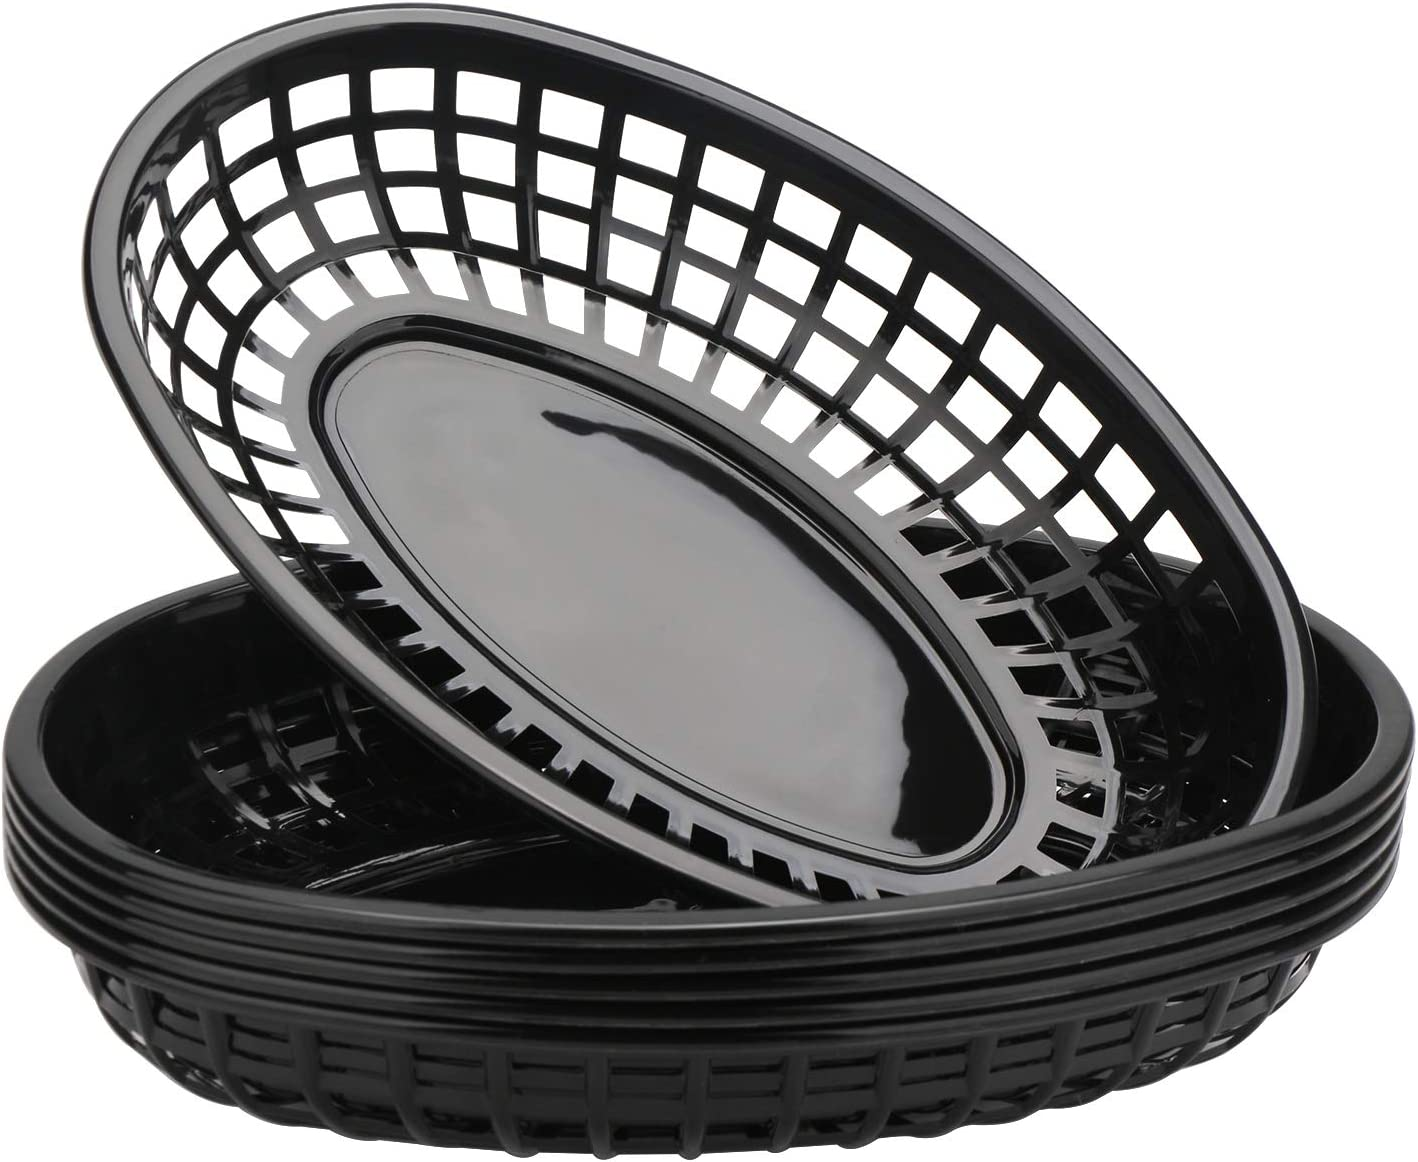 Bread Baskets, Eusoar 6Pcs 9.4